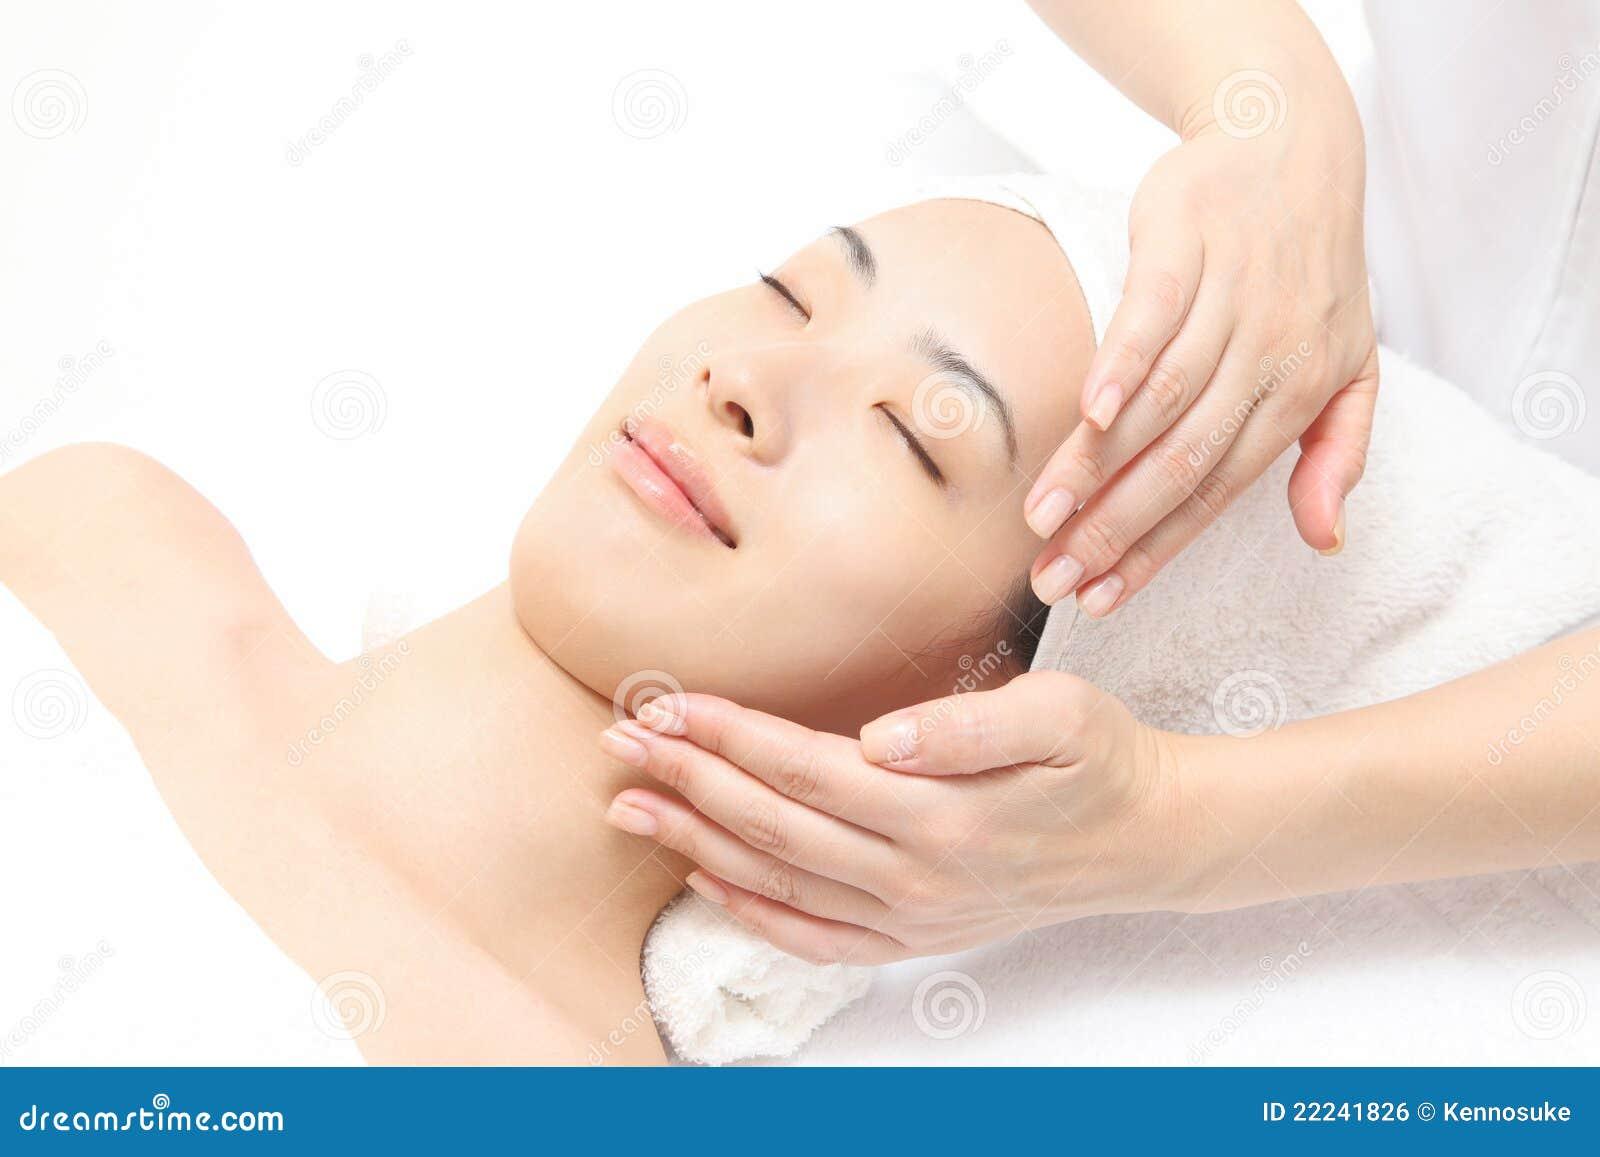 Massage Room Video Free Download